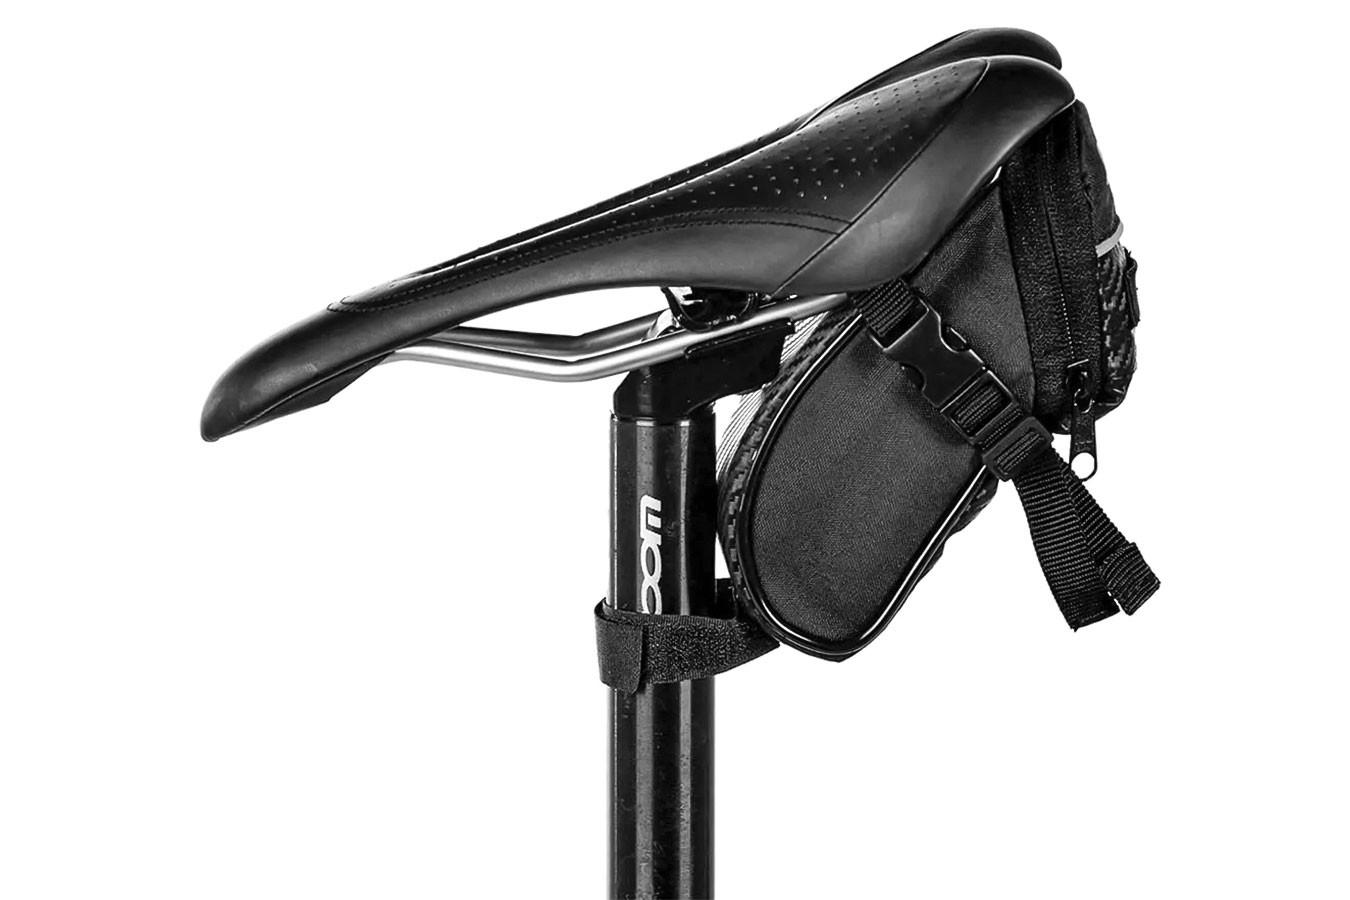 Bolsa para Selim Bike Pro - Próbike